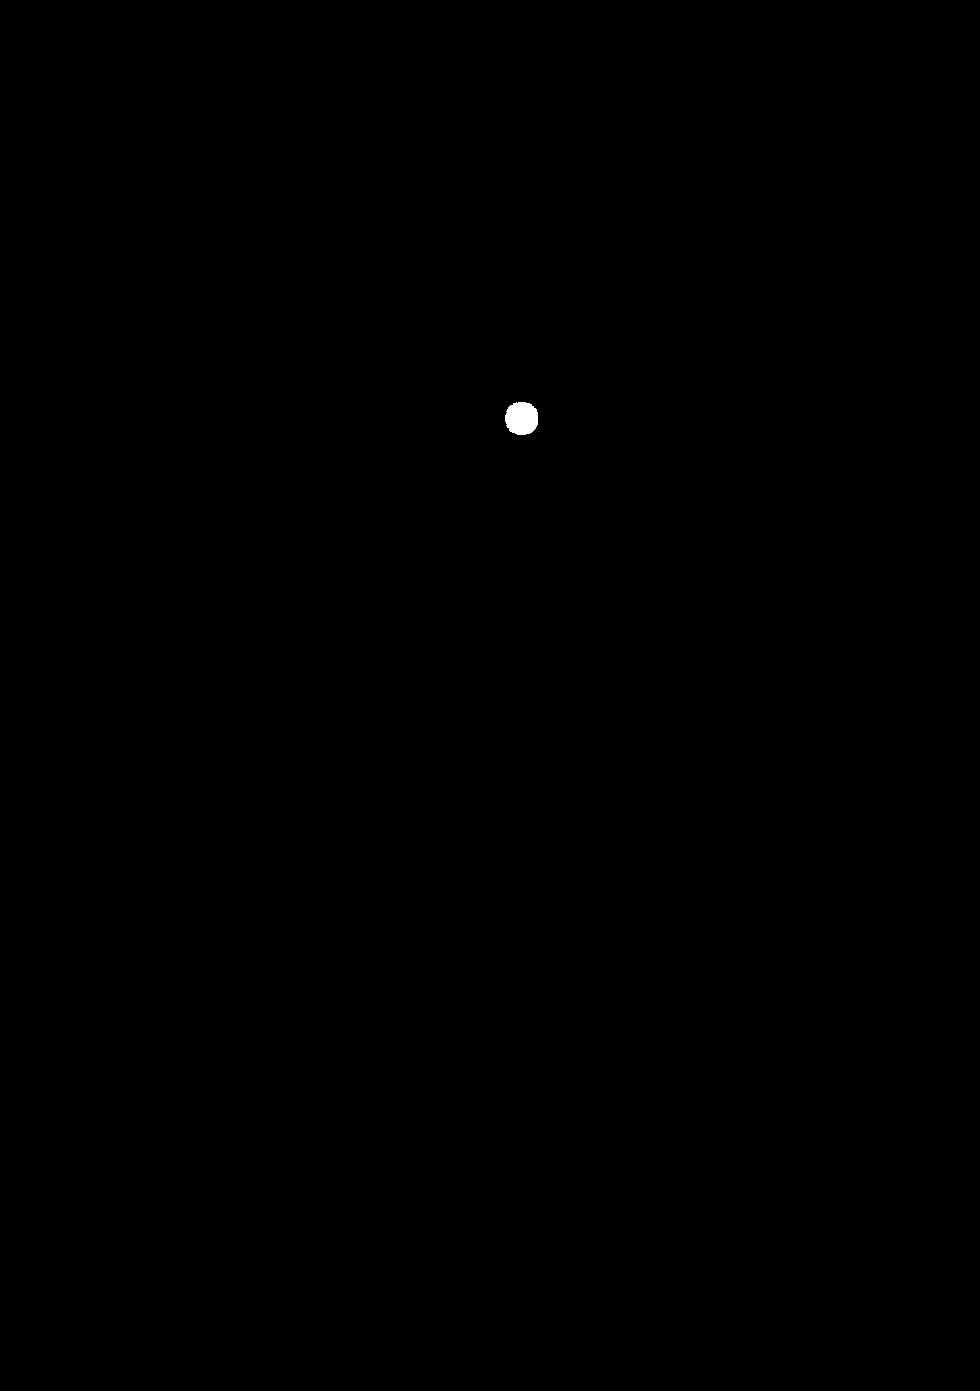 Linktia_Profile copy 4.png